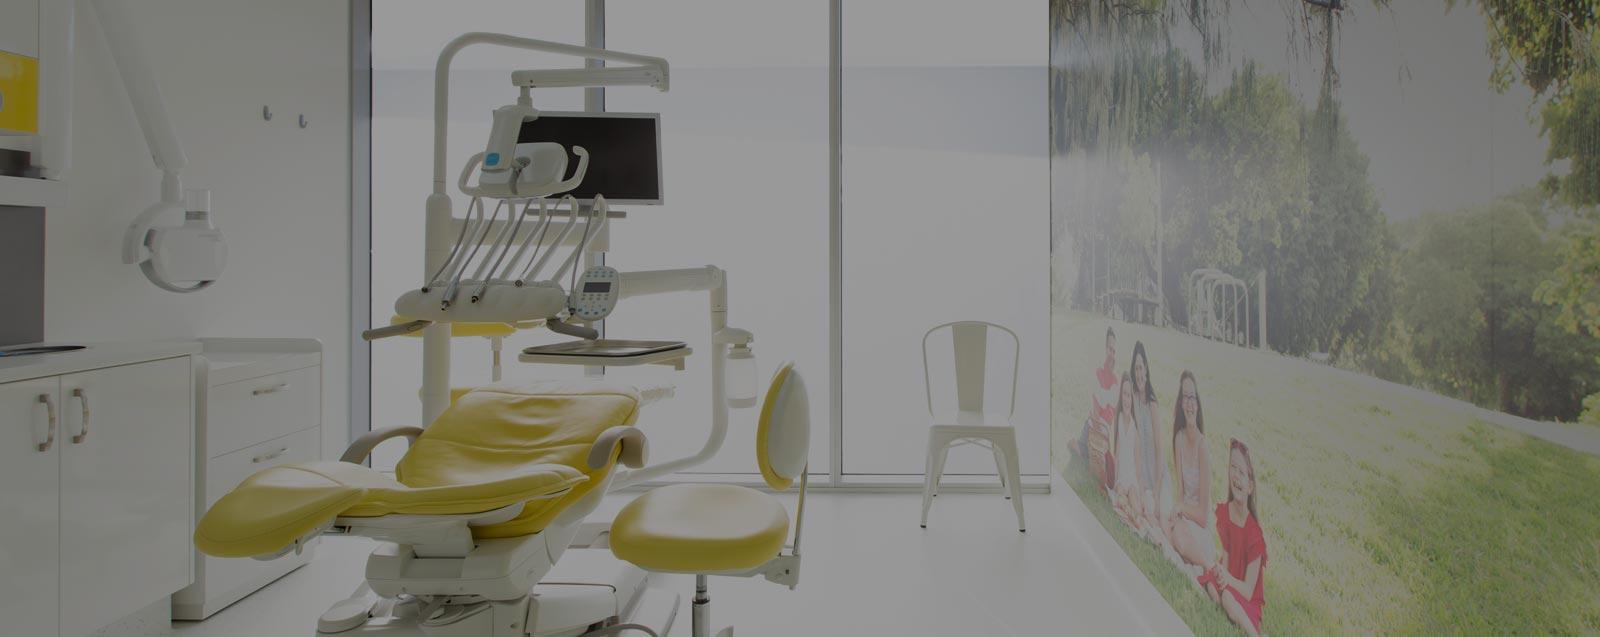 Queensland Country Dental practice fitout by McKibbin Design